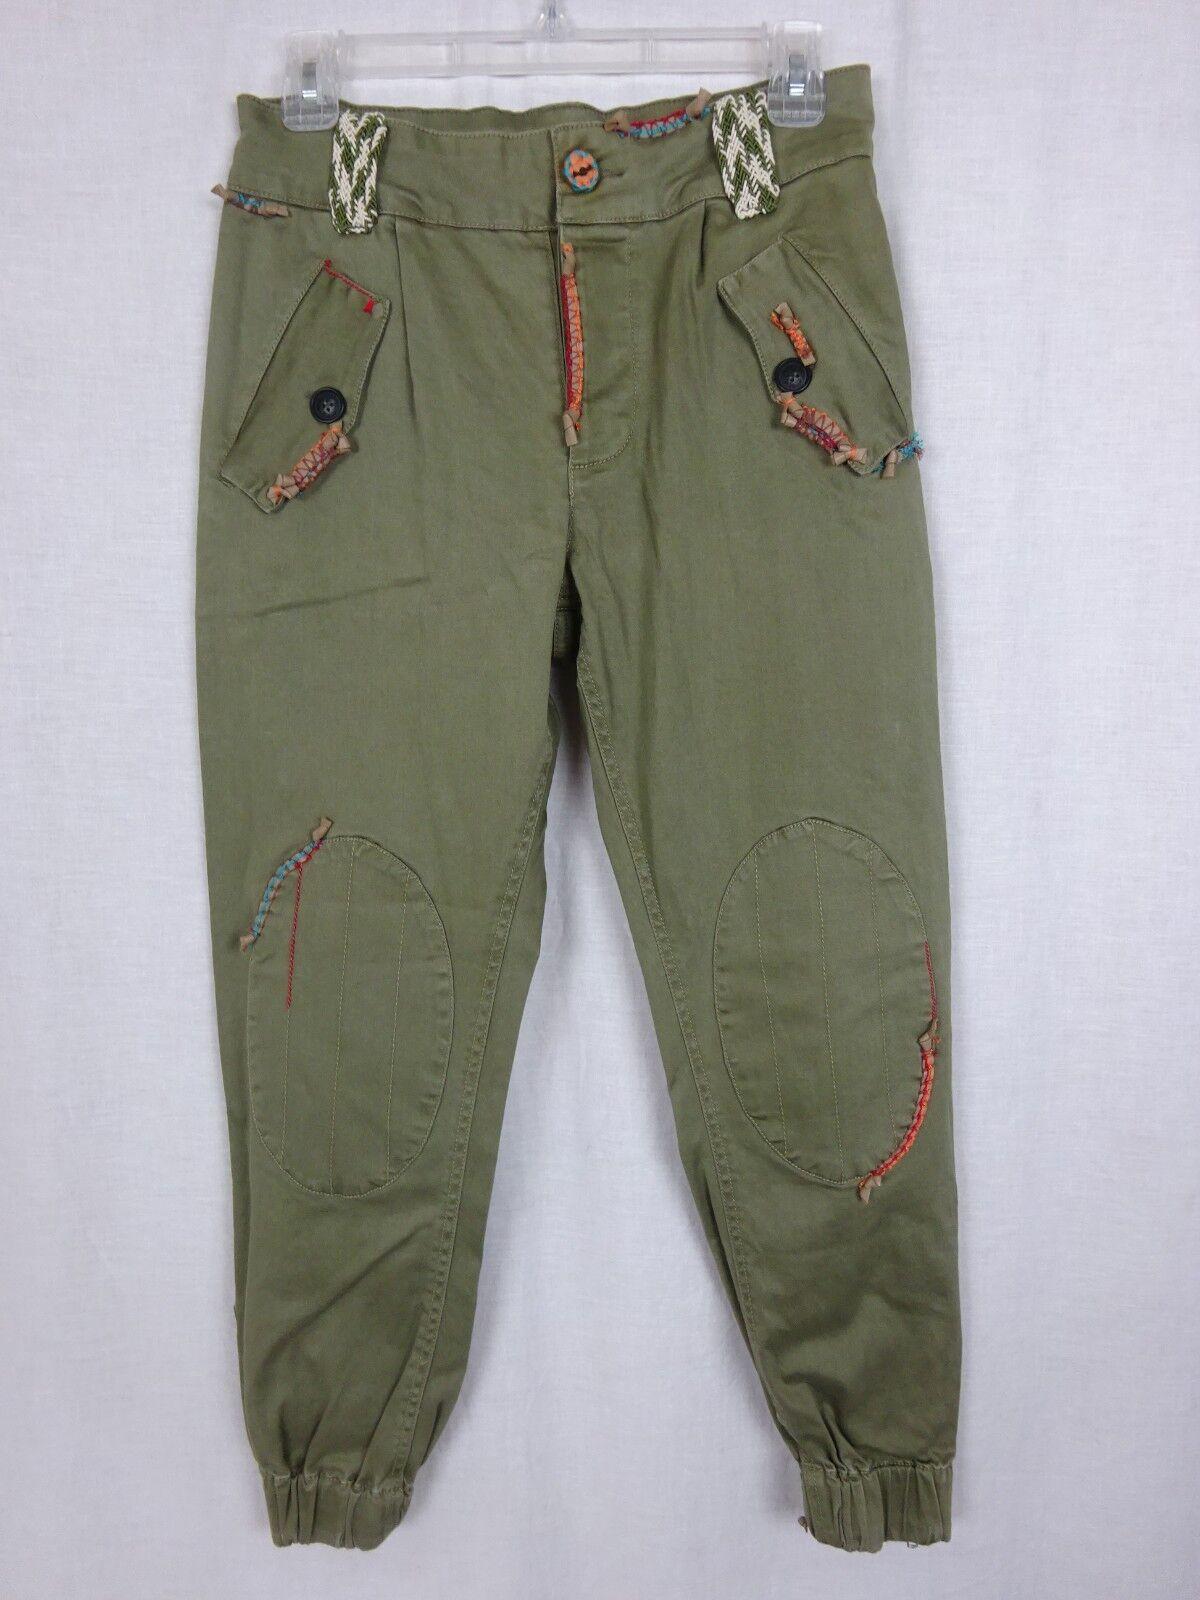 Mr & Mrs Furs Pants Military Grün Woven Accents Knee Patches Zipper Cuffs  M